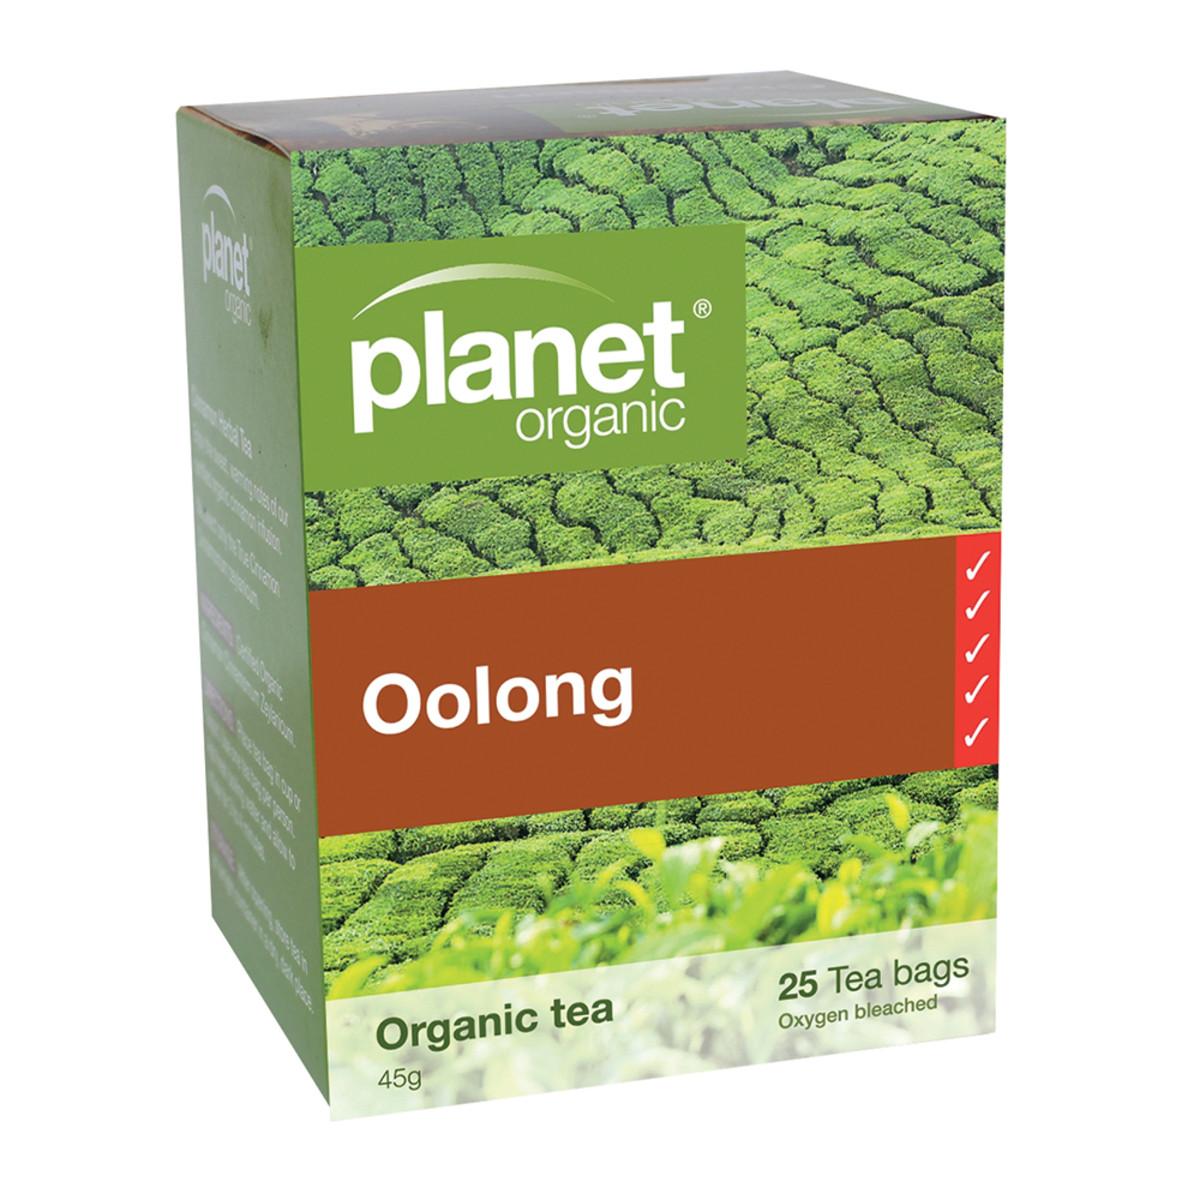 PLANET ORGANIC OOLONG TEA ORG 25TB